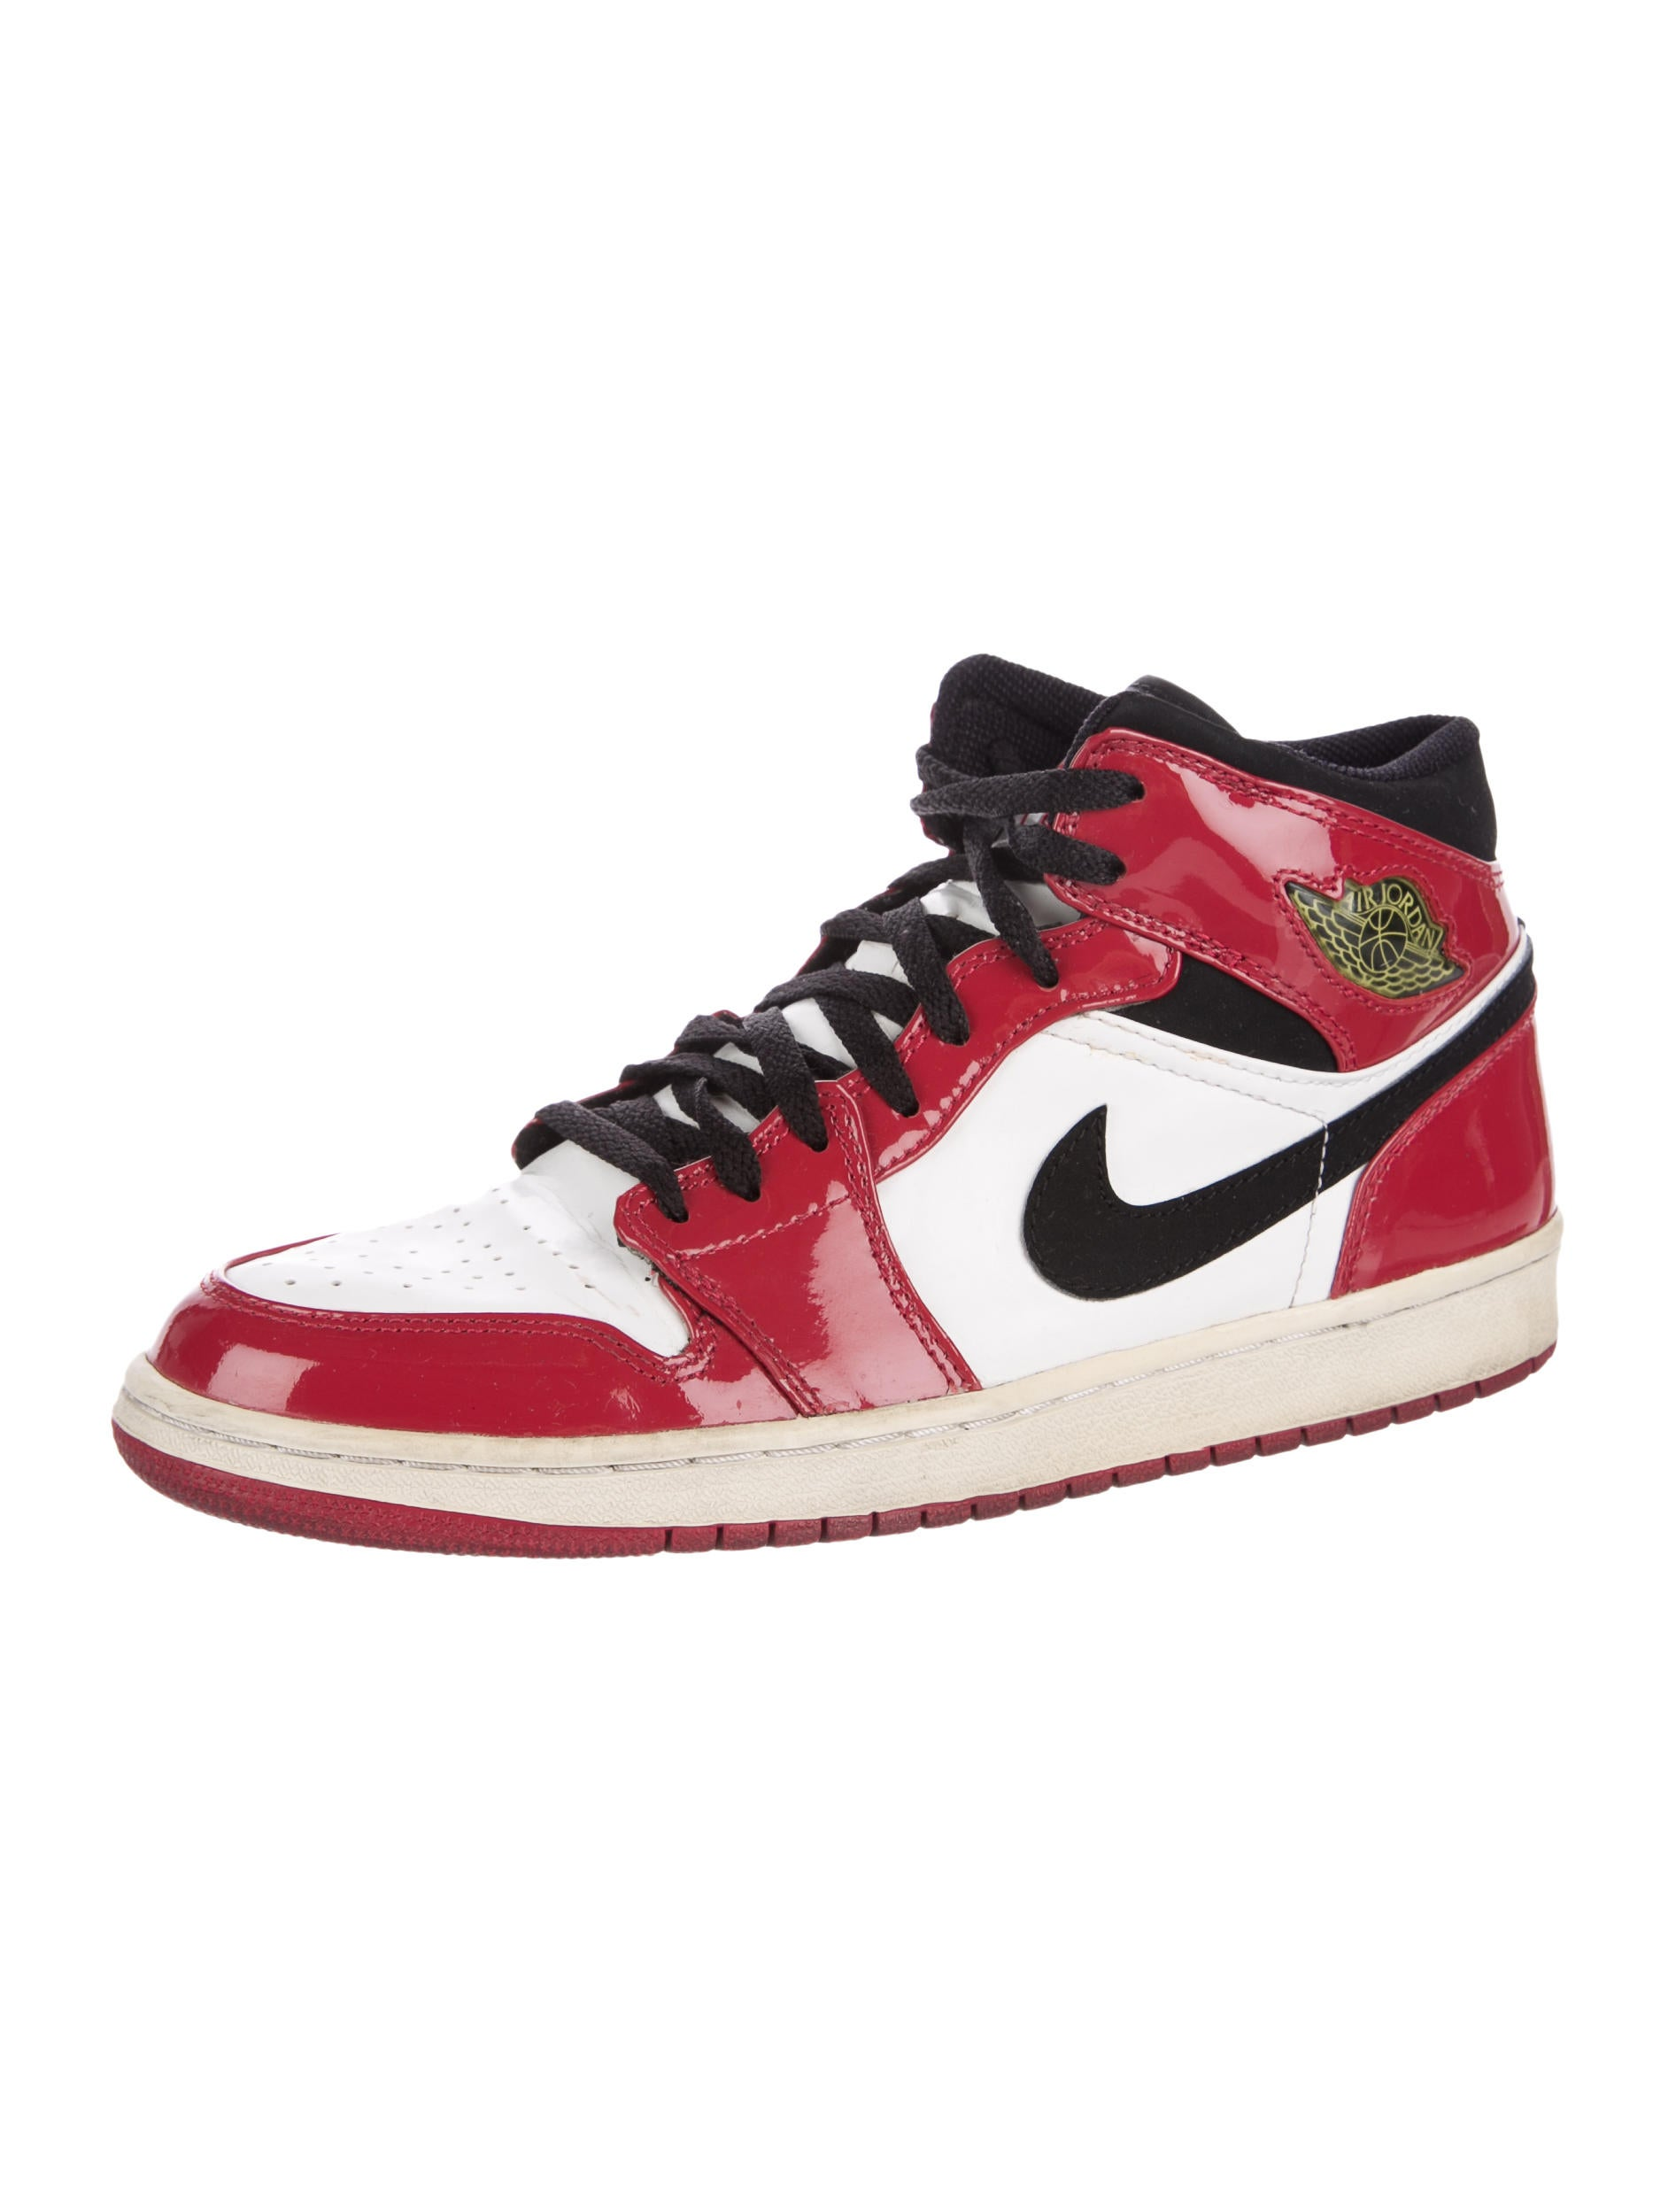 nike air jordan 1 retro mid top sneakers shoes. Black Bedroom Furniture Sets. Home Design Ideas